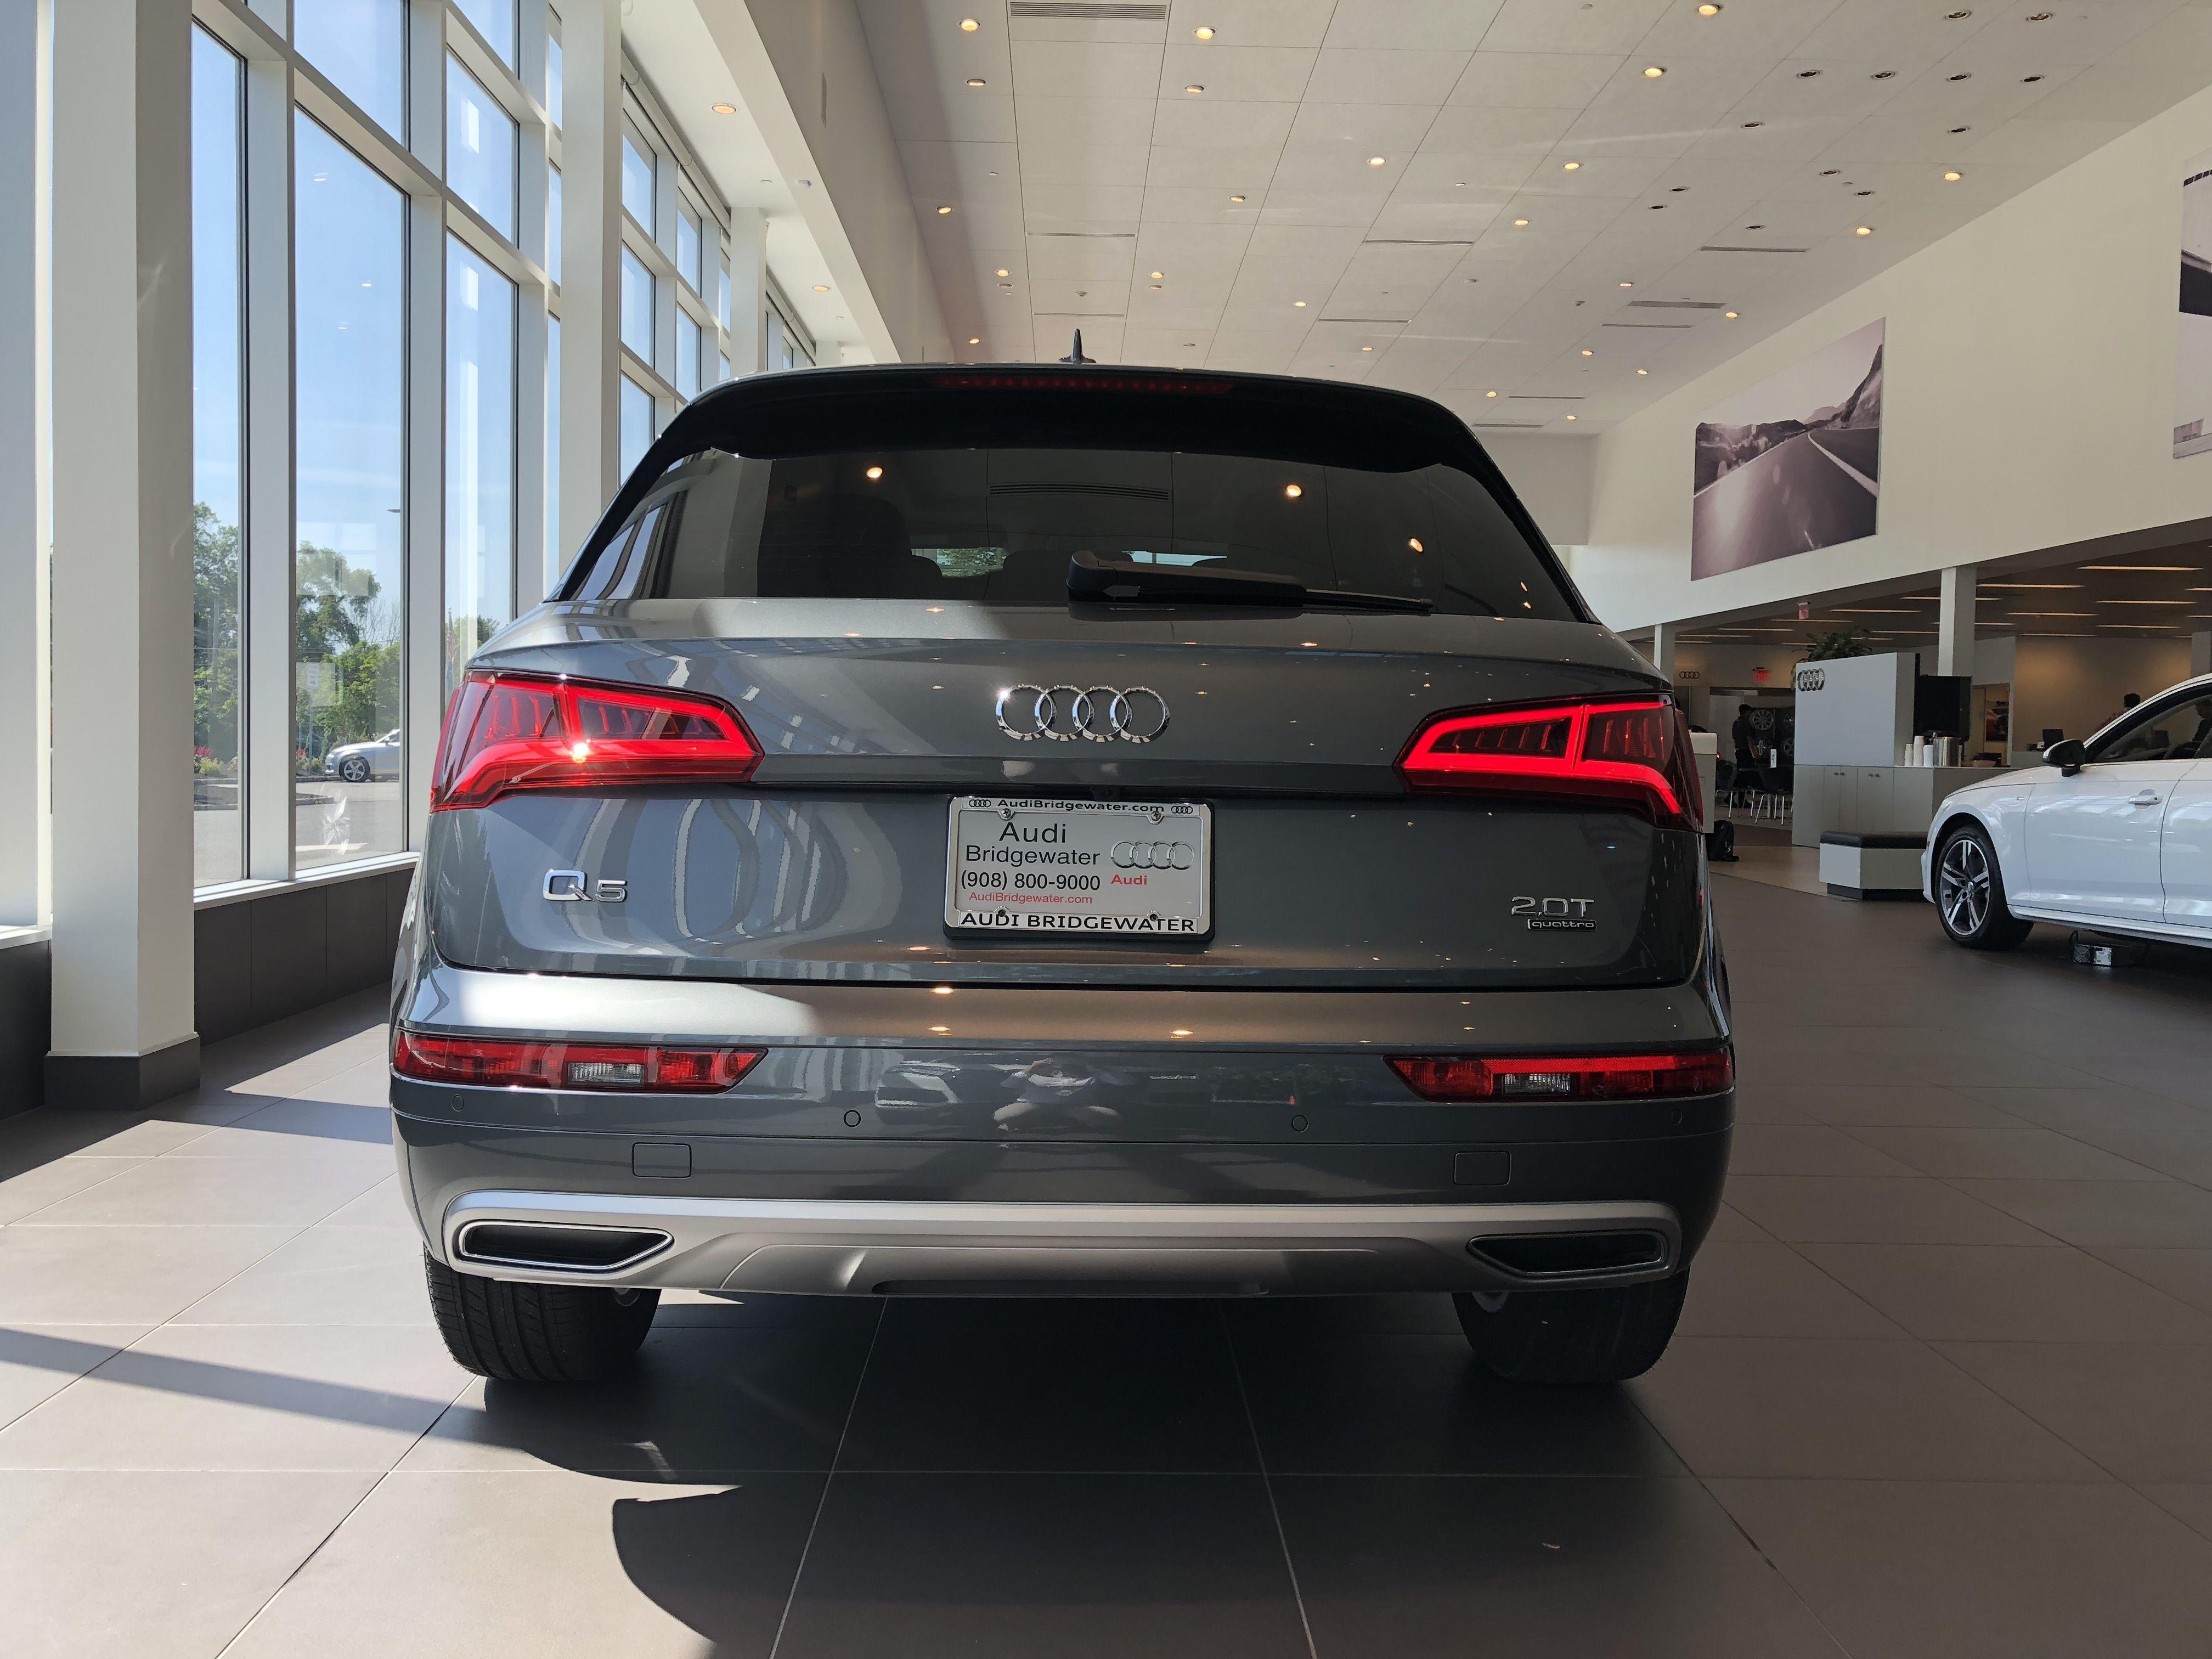 Rear View Of 2018 Audi Q5 In Monsoon Grey Metallic Vehicle